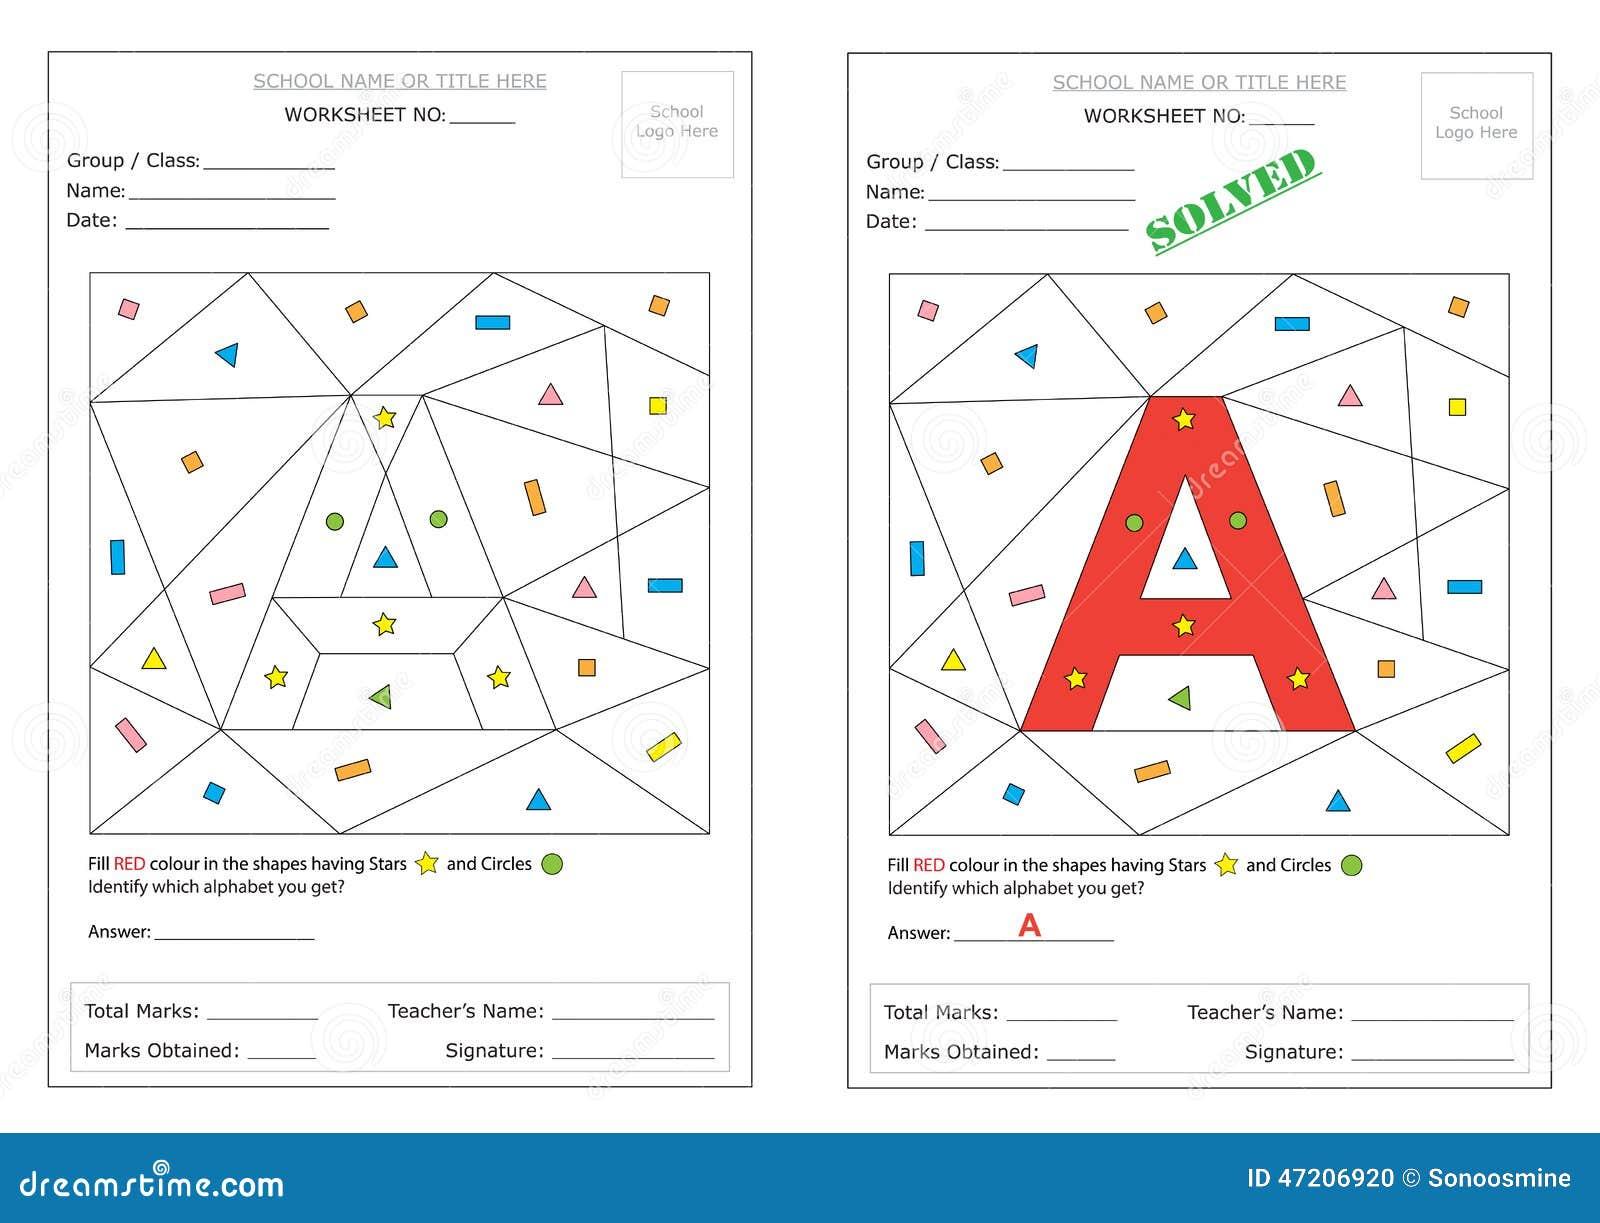 Worksheet - Identify Alphabet Stock Vector - Image: 47206920